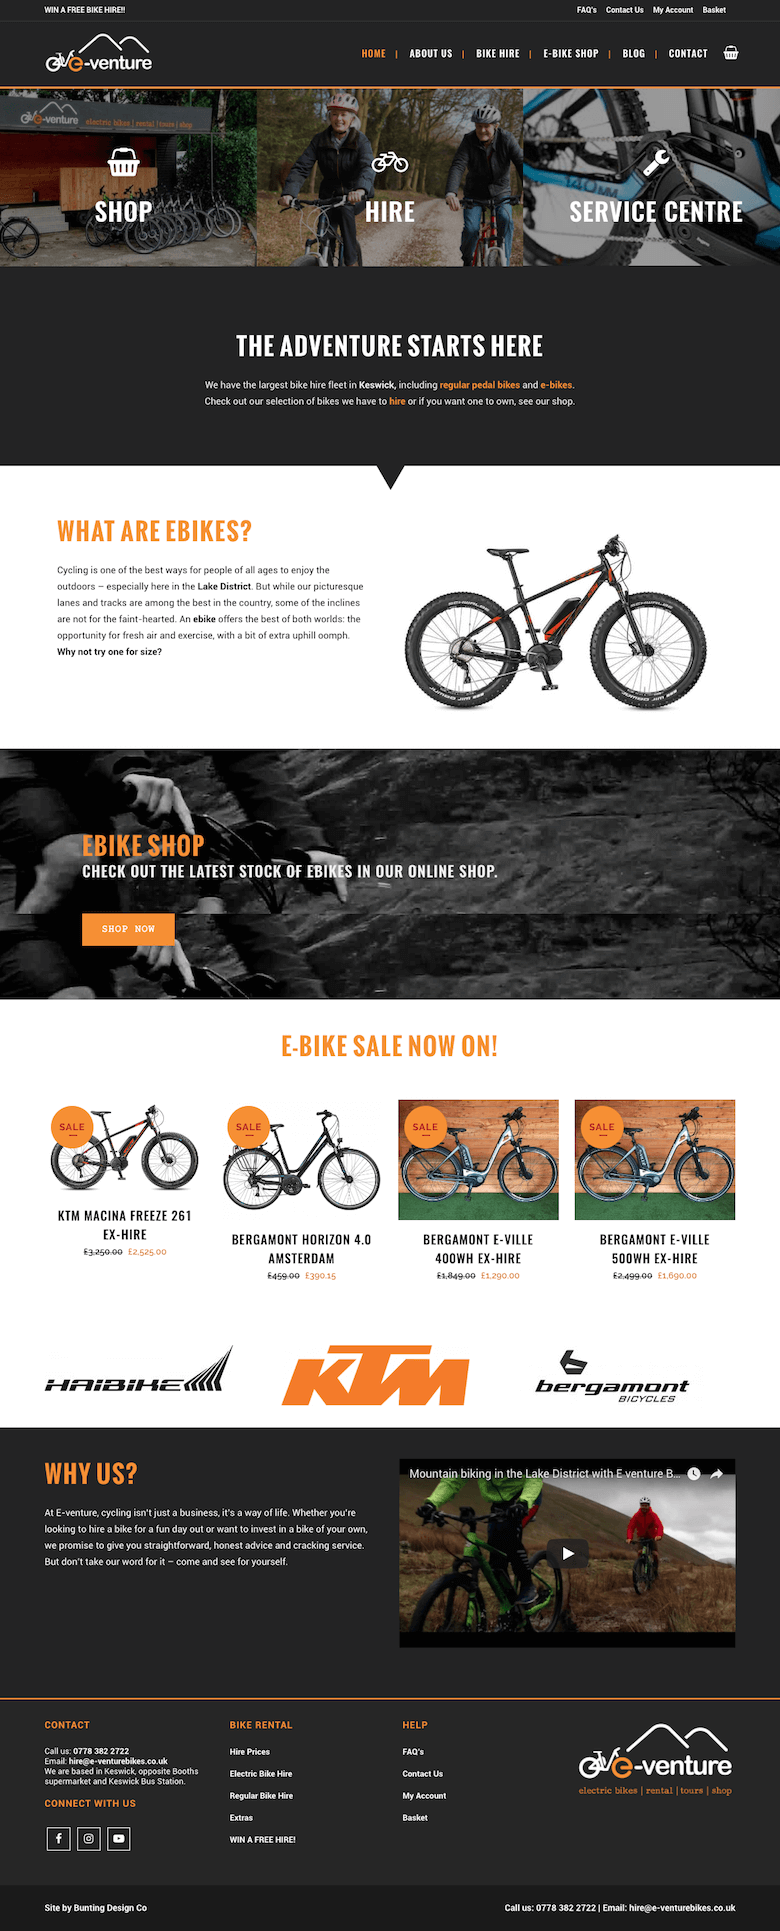 Bunting Design Co Web Development Design Website Design Inspiration Bunting Design